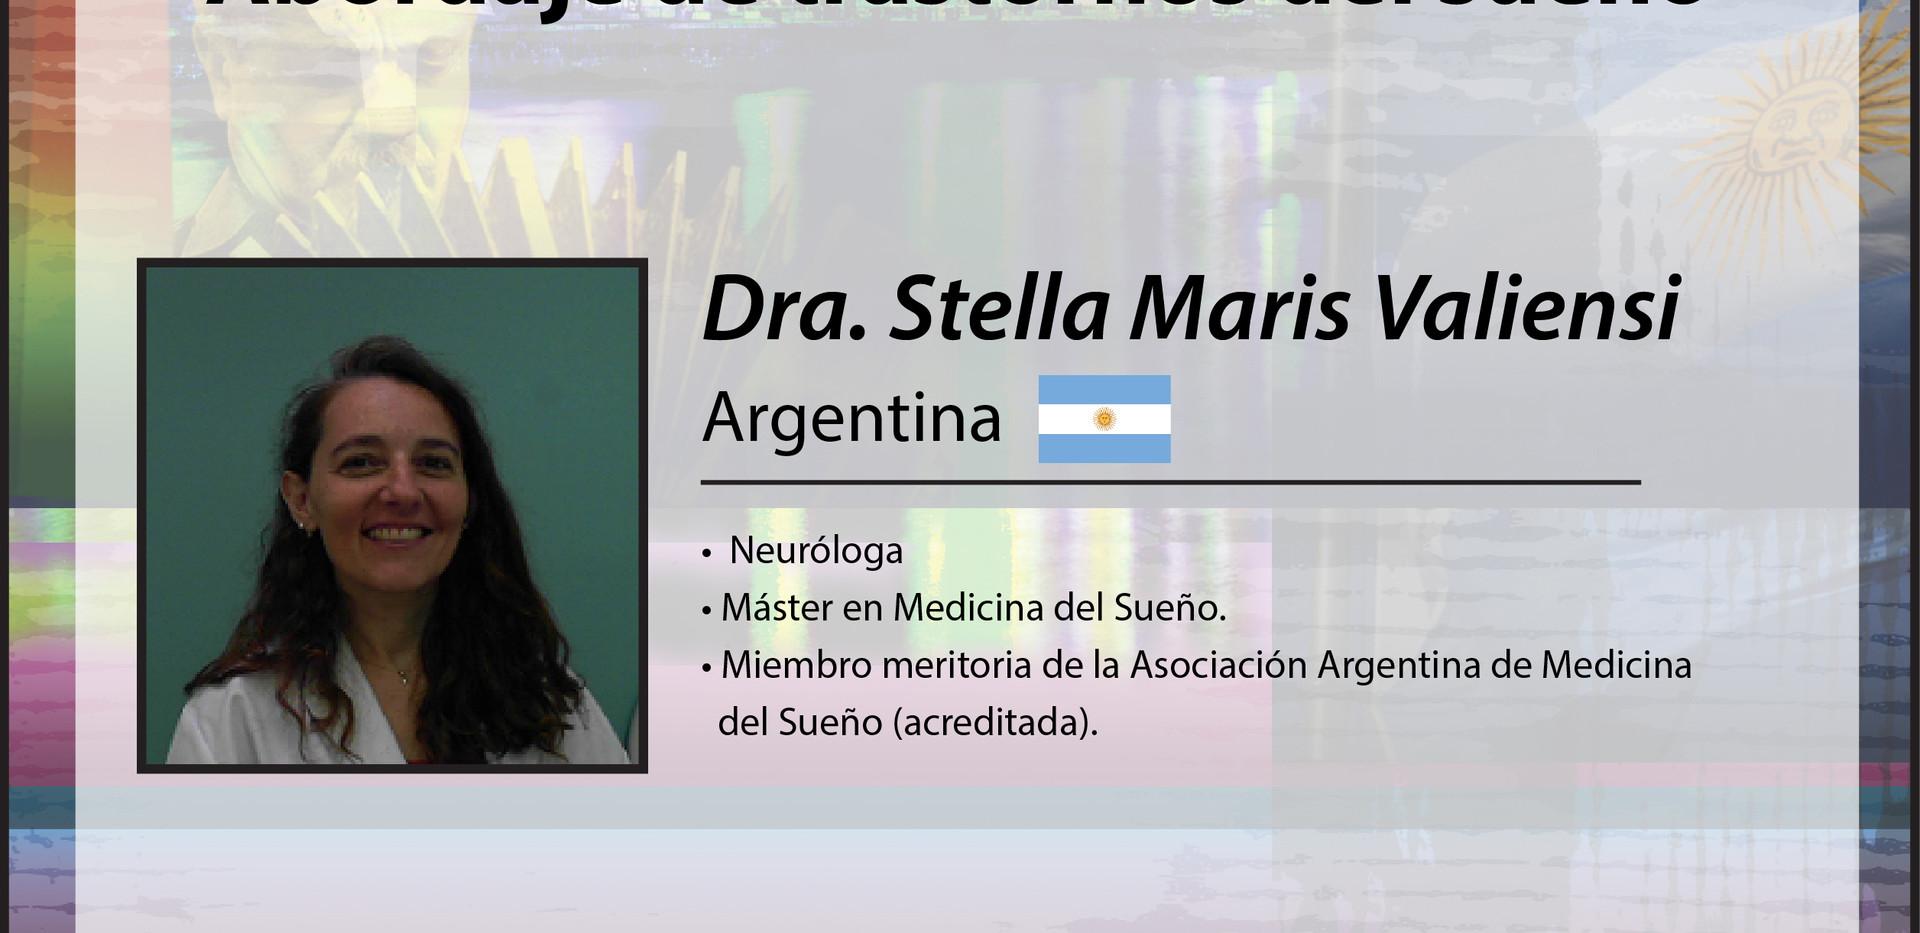 Dra. Stella Maris Valiensi